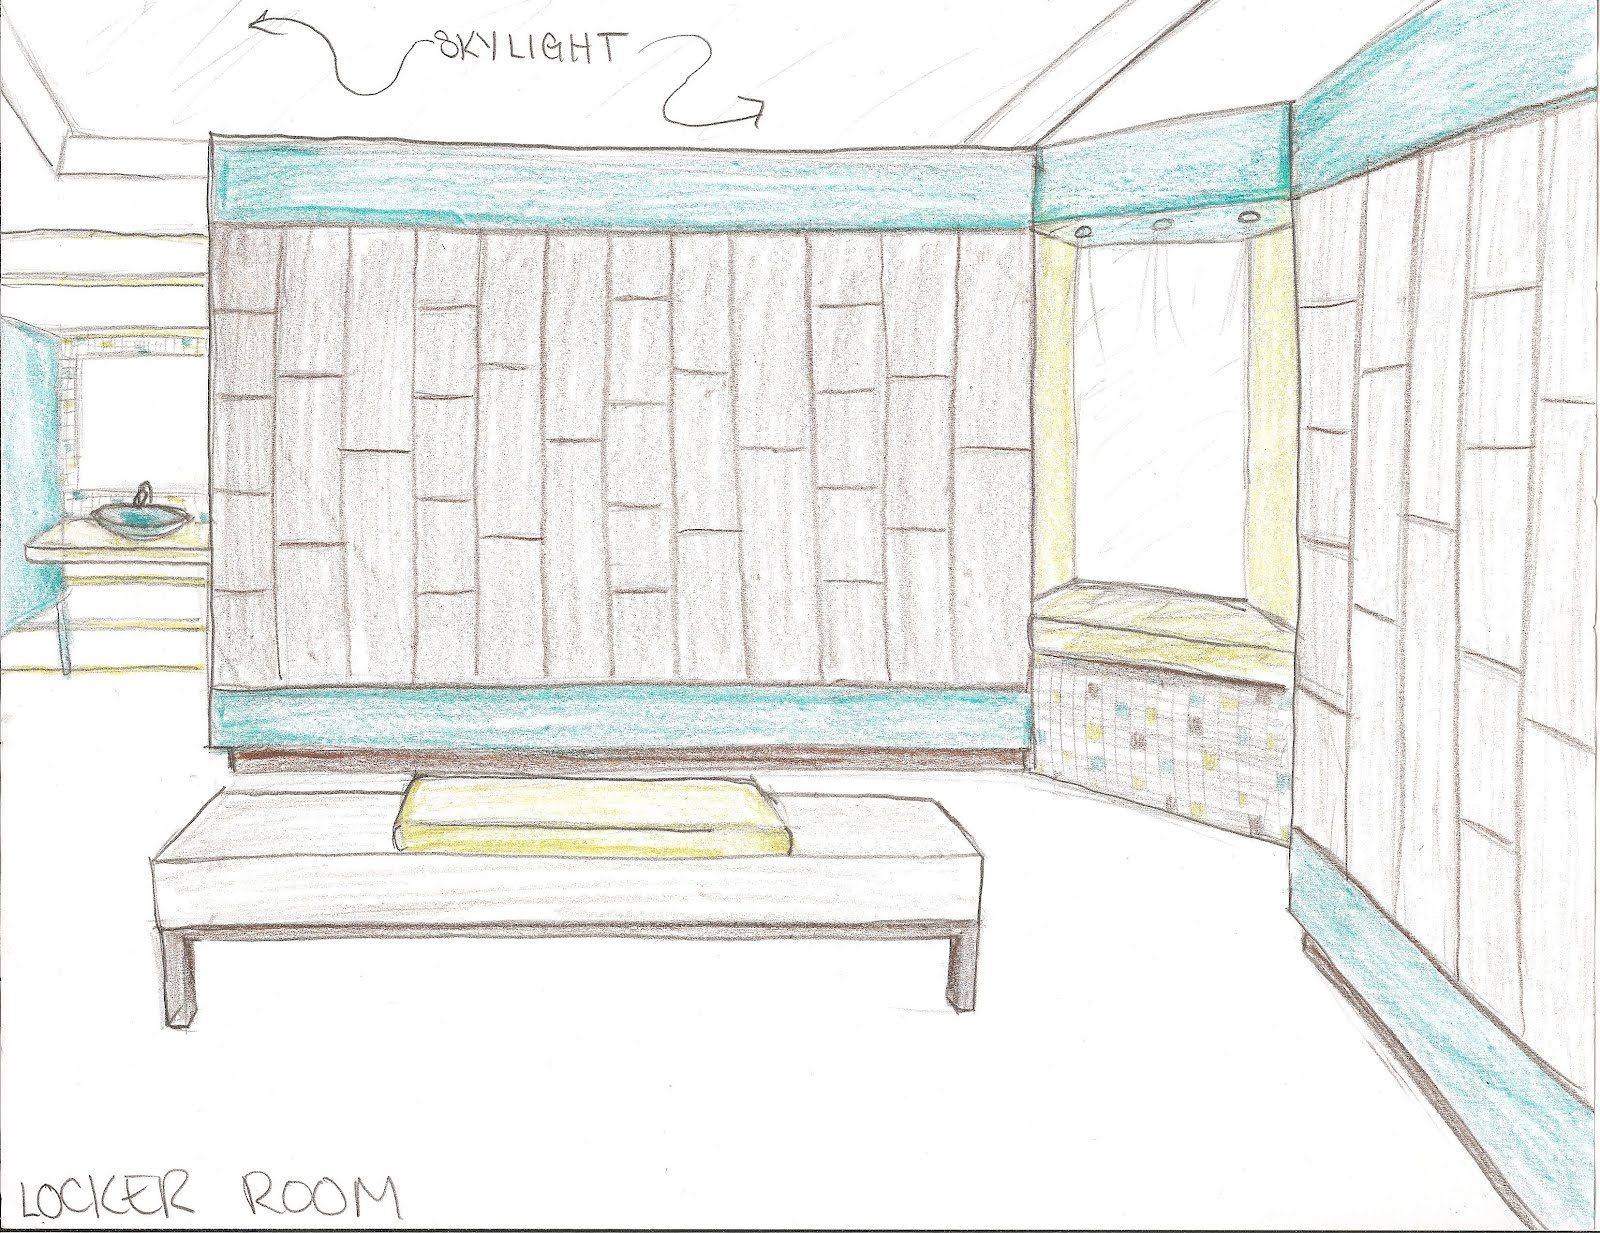 Captivated By Design Locker Room Charette